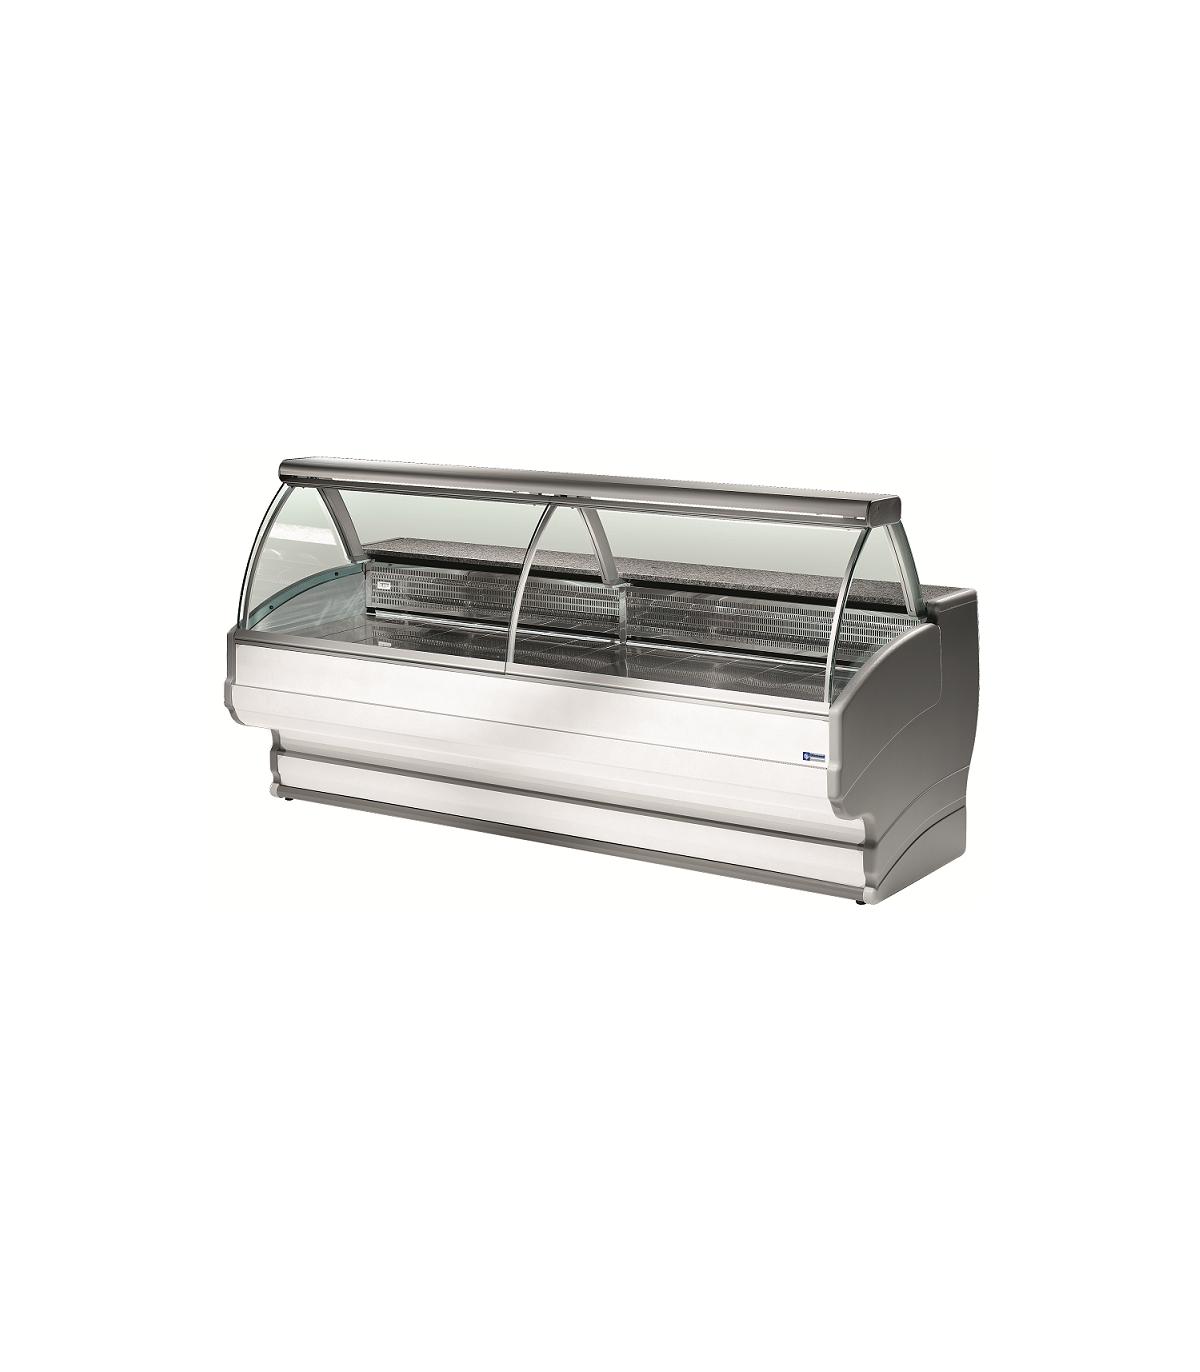 vitrine r frig r e de comptoir positive froid statique ou. Black Bedroom Furniture Sets. Home Design Ideas